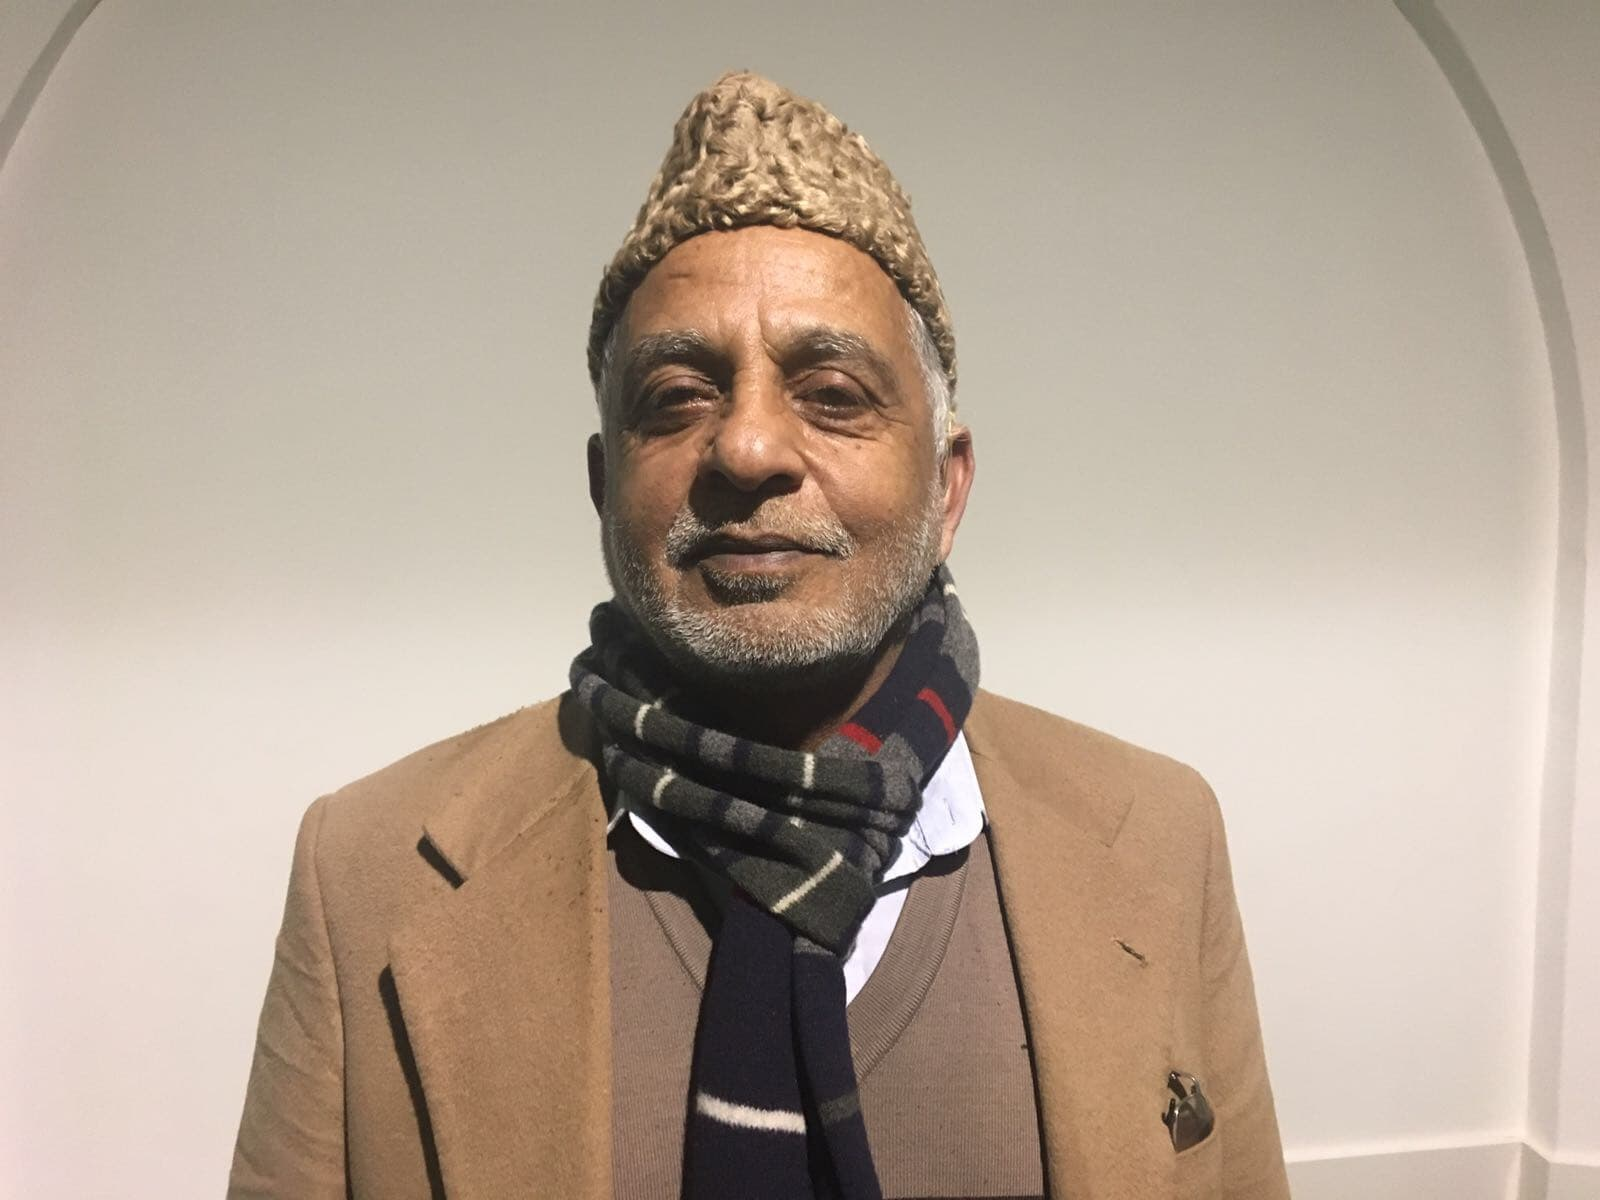 Mr. Abdul Basit Malik